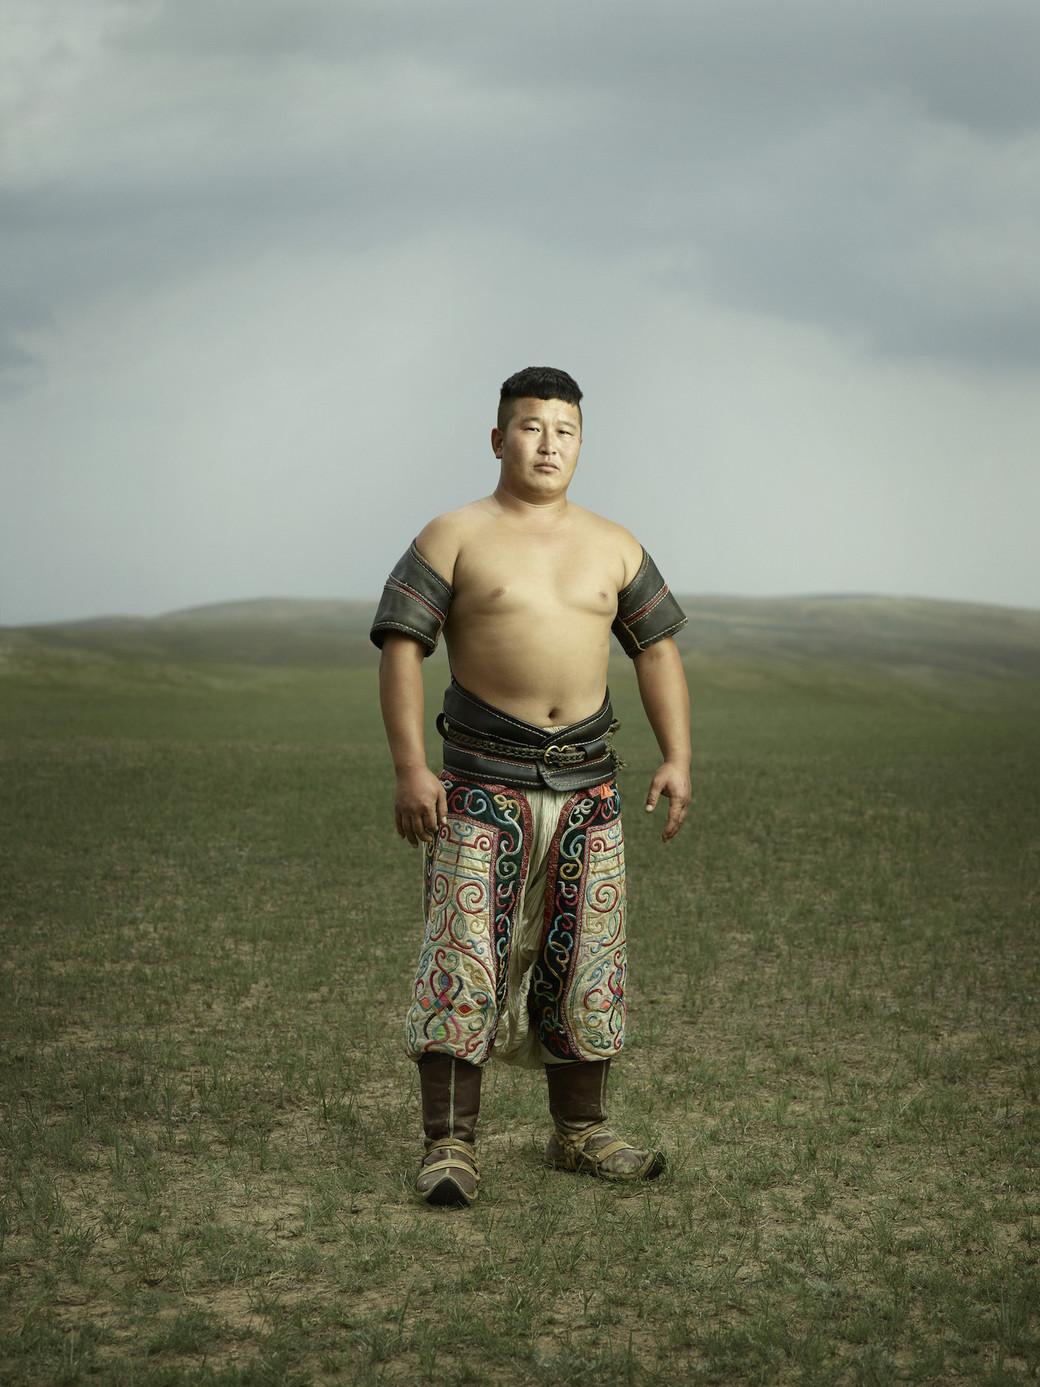 Mongolia wrestling Bokh portrait young man